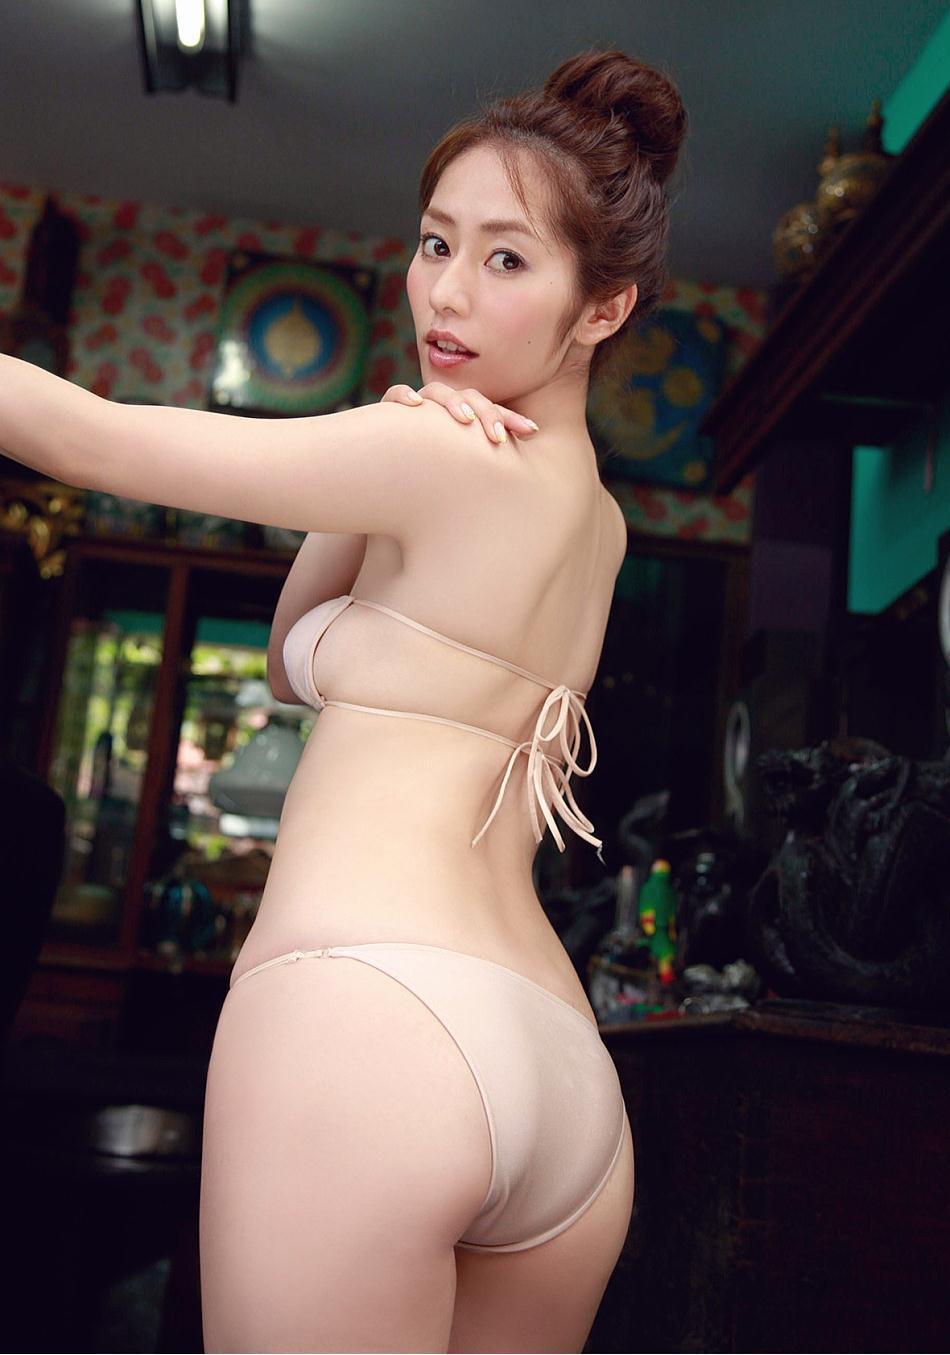 tani_momoko181.jpg